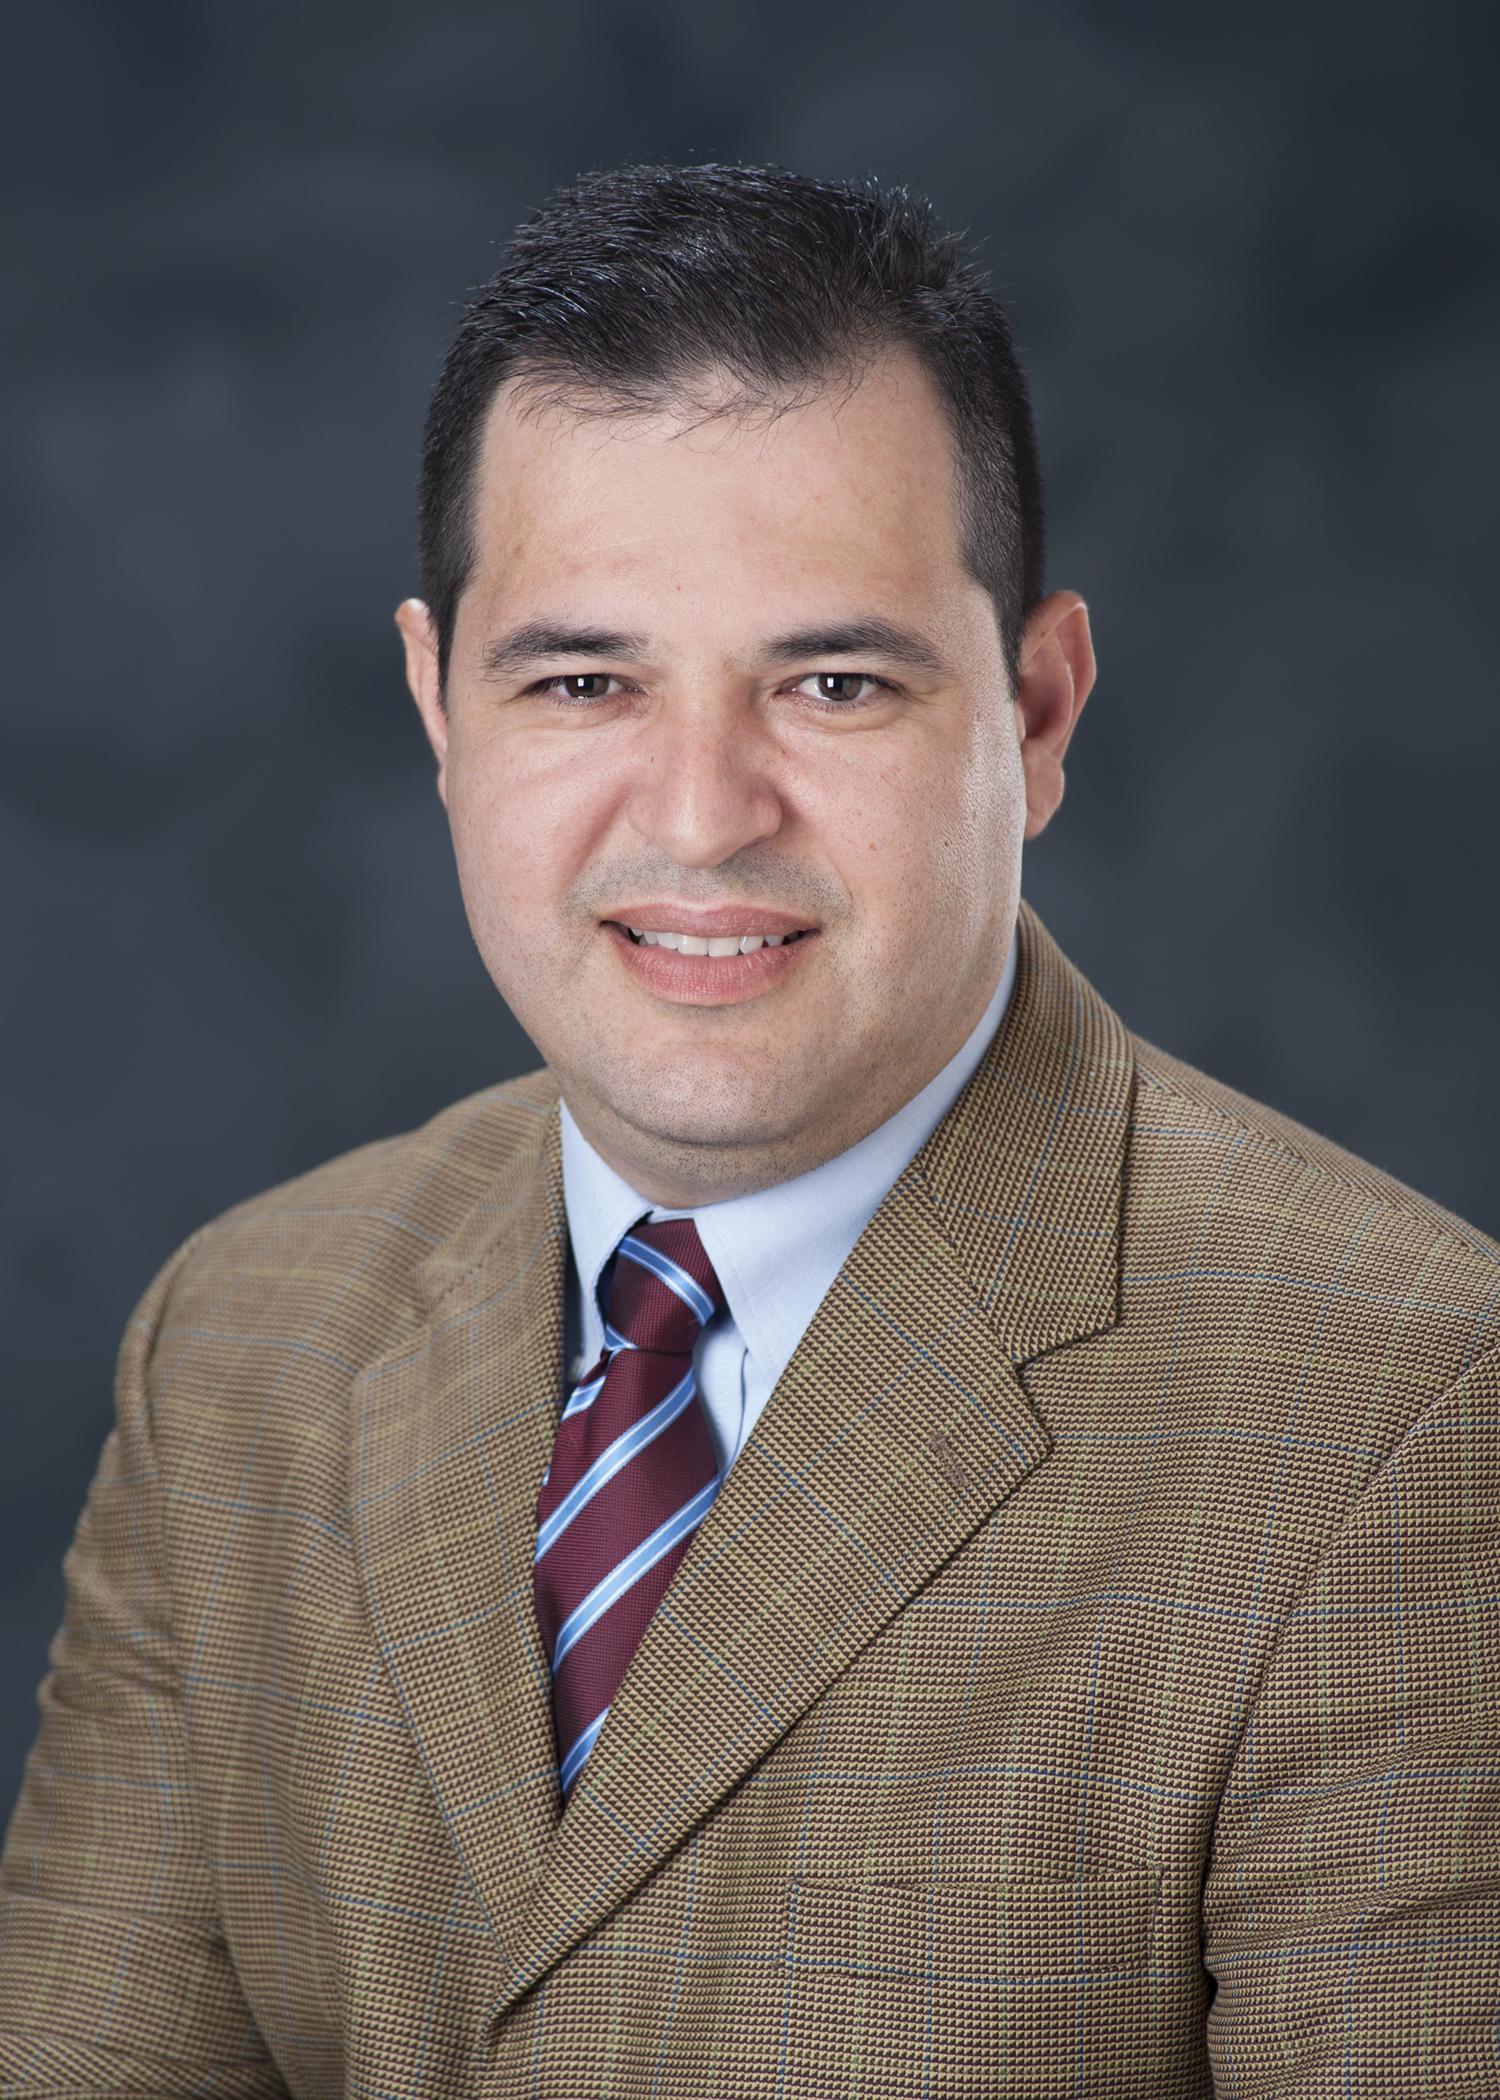 Heriberto  Gonzalez Lozano, Ph.D.